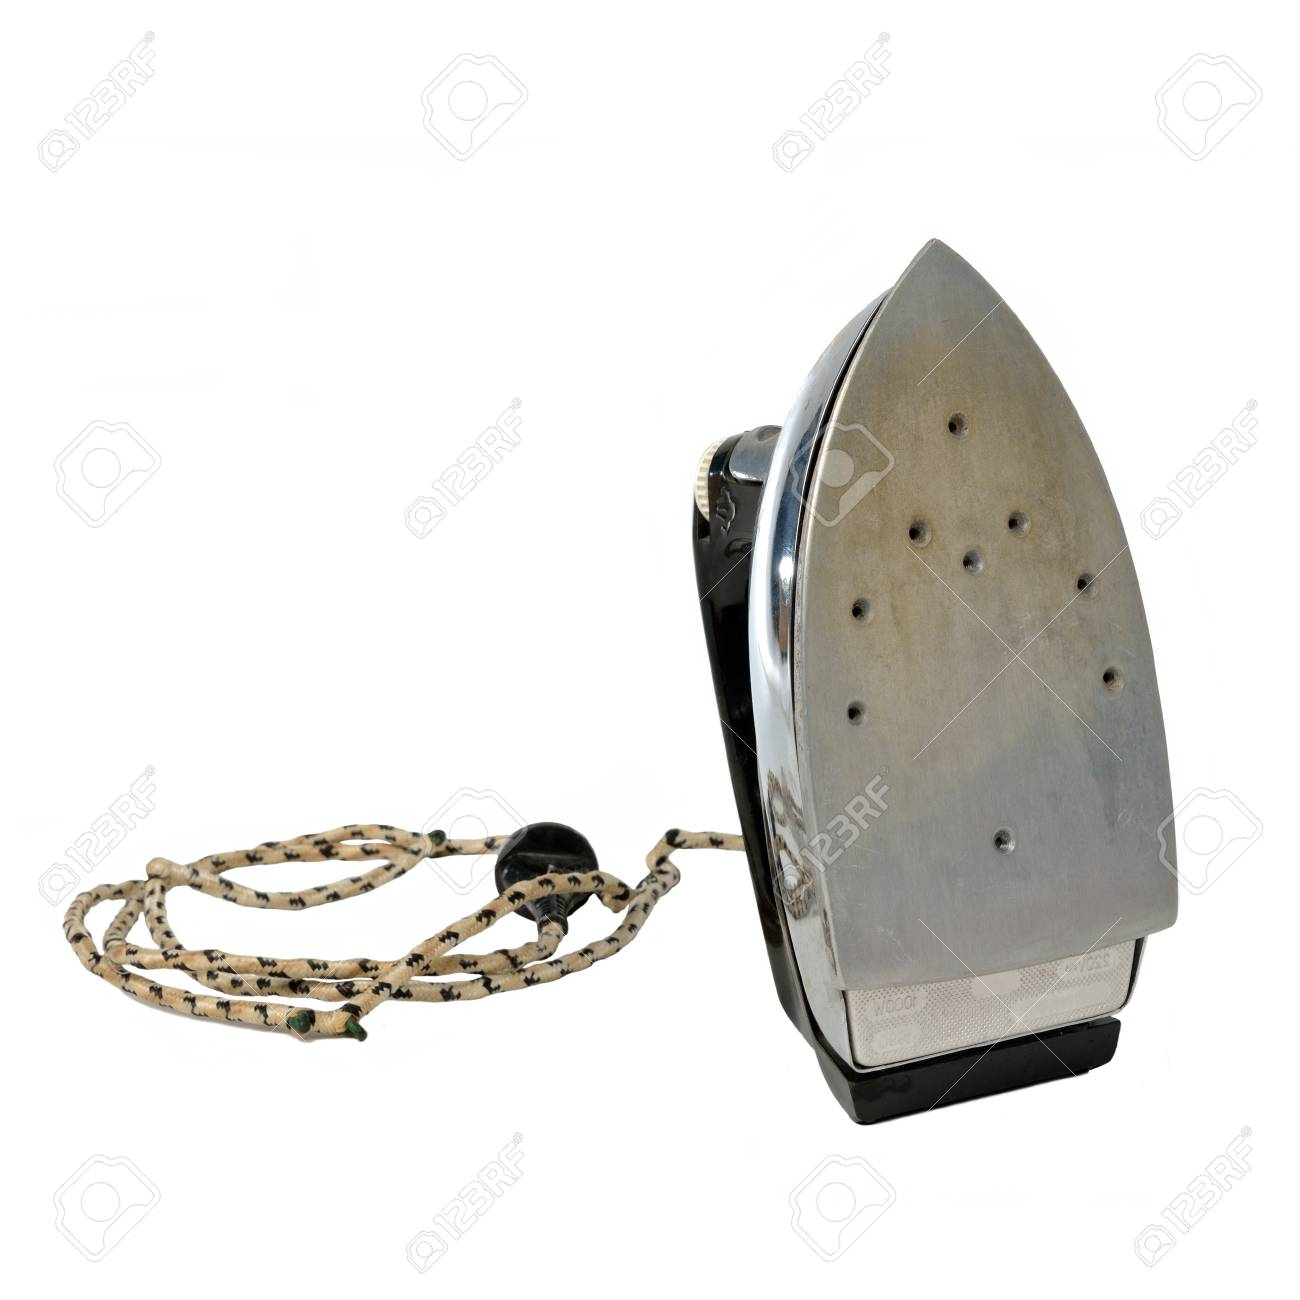 Vintage iron against white background Stock Photo - 13904041